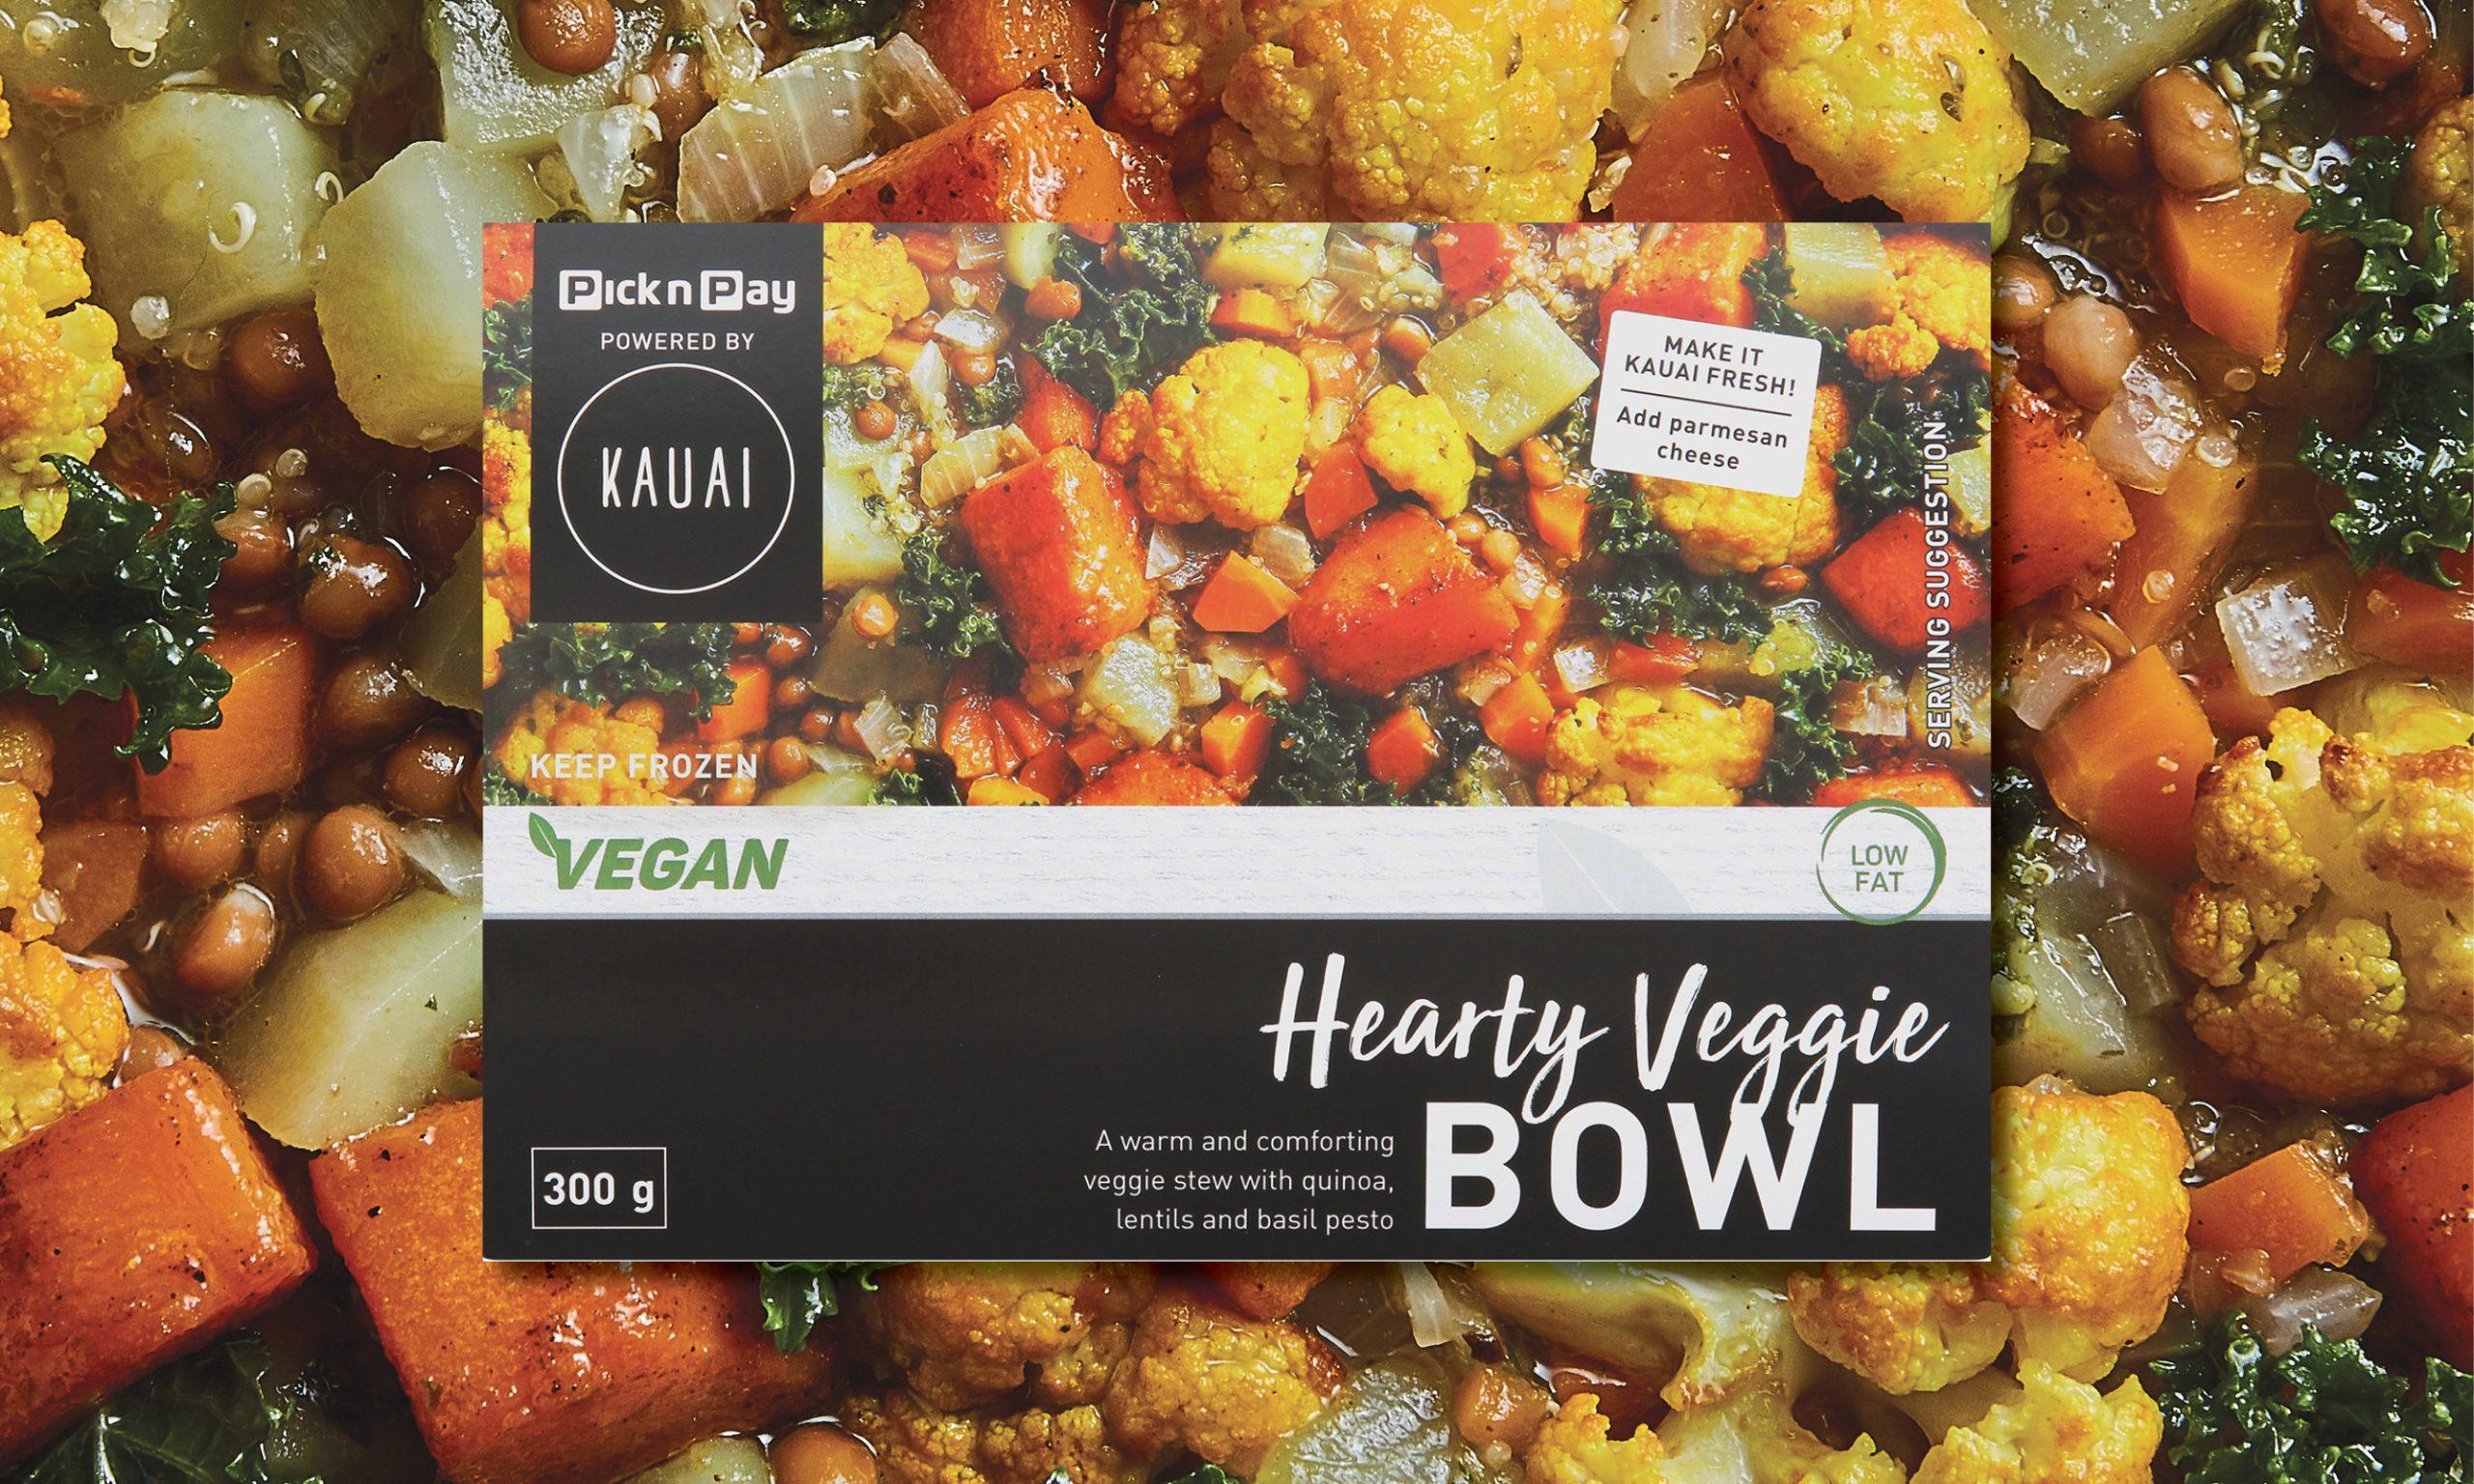 Kauai x PnP Hearty Veggie Bowl